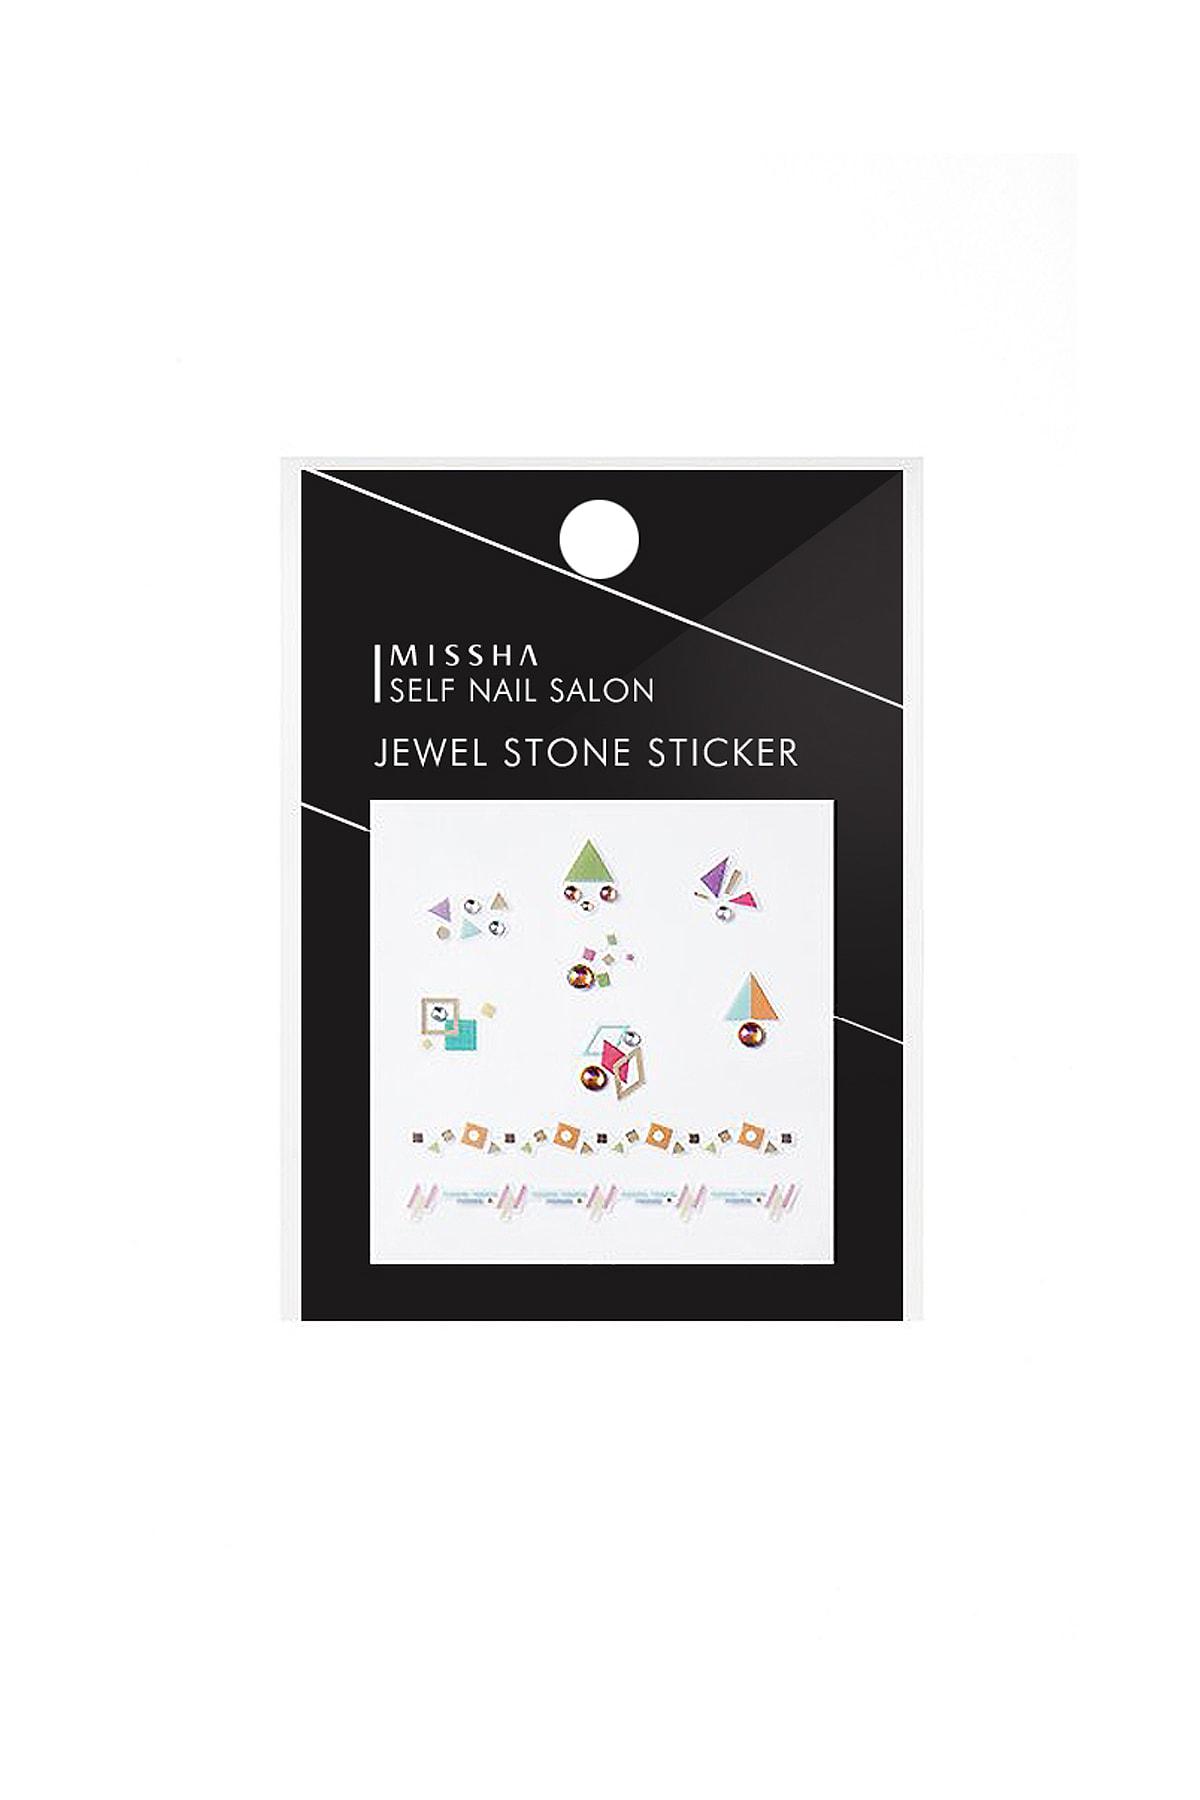 Missha Mücevher Tırnak Süsü Self Nail Salon Jewel Stone Sticker (No.05/Sprinkle)